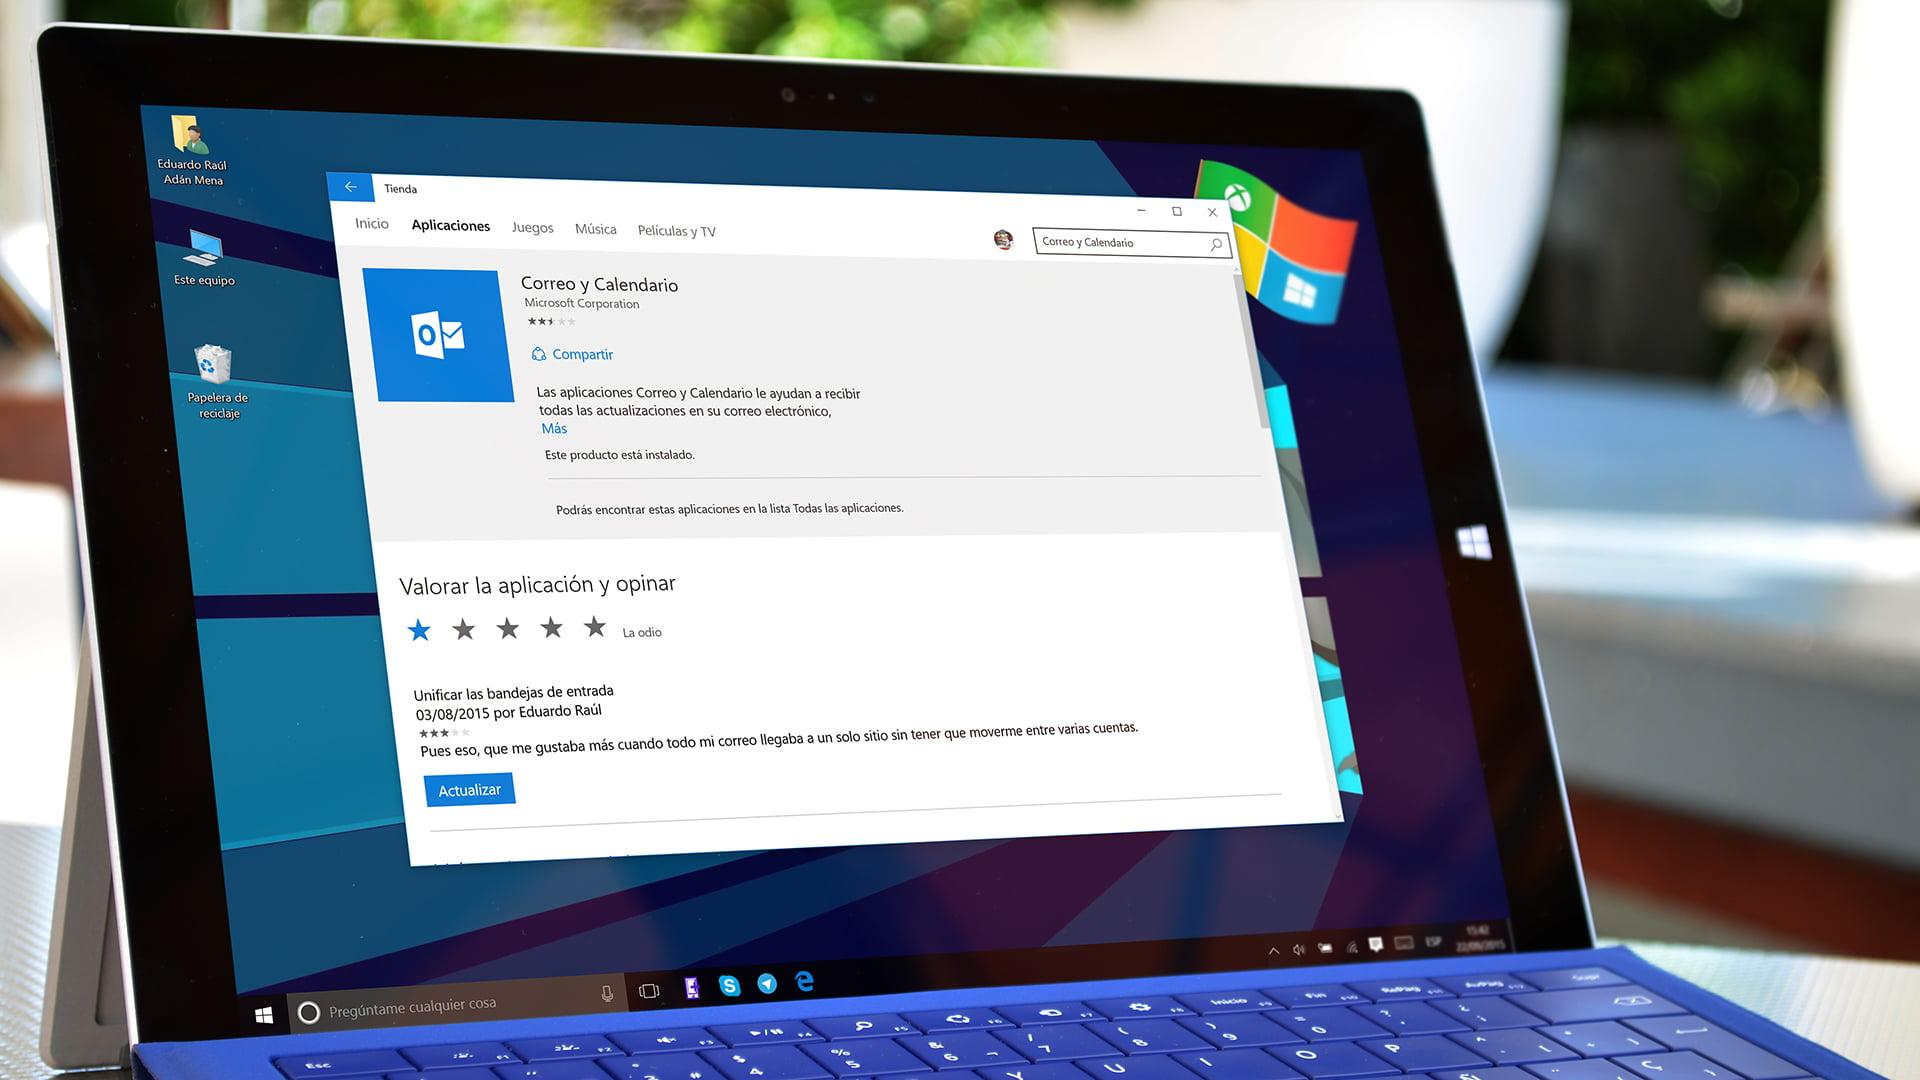 Aplicación universal de Windows 10